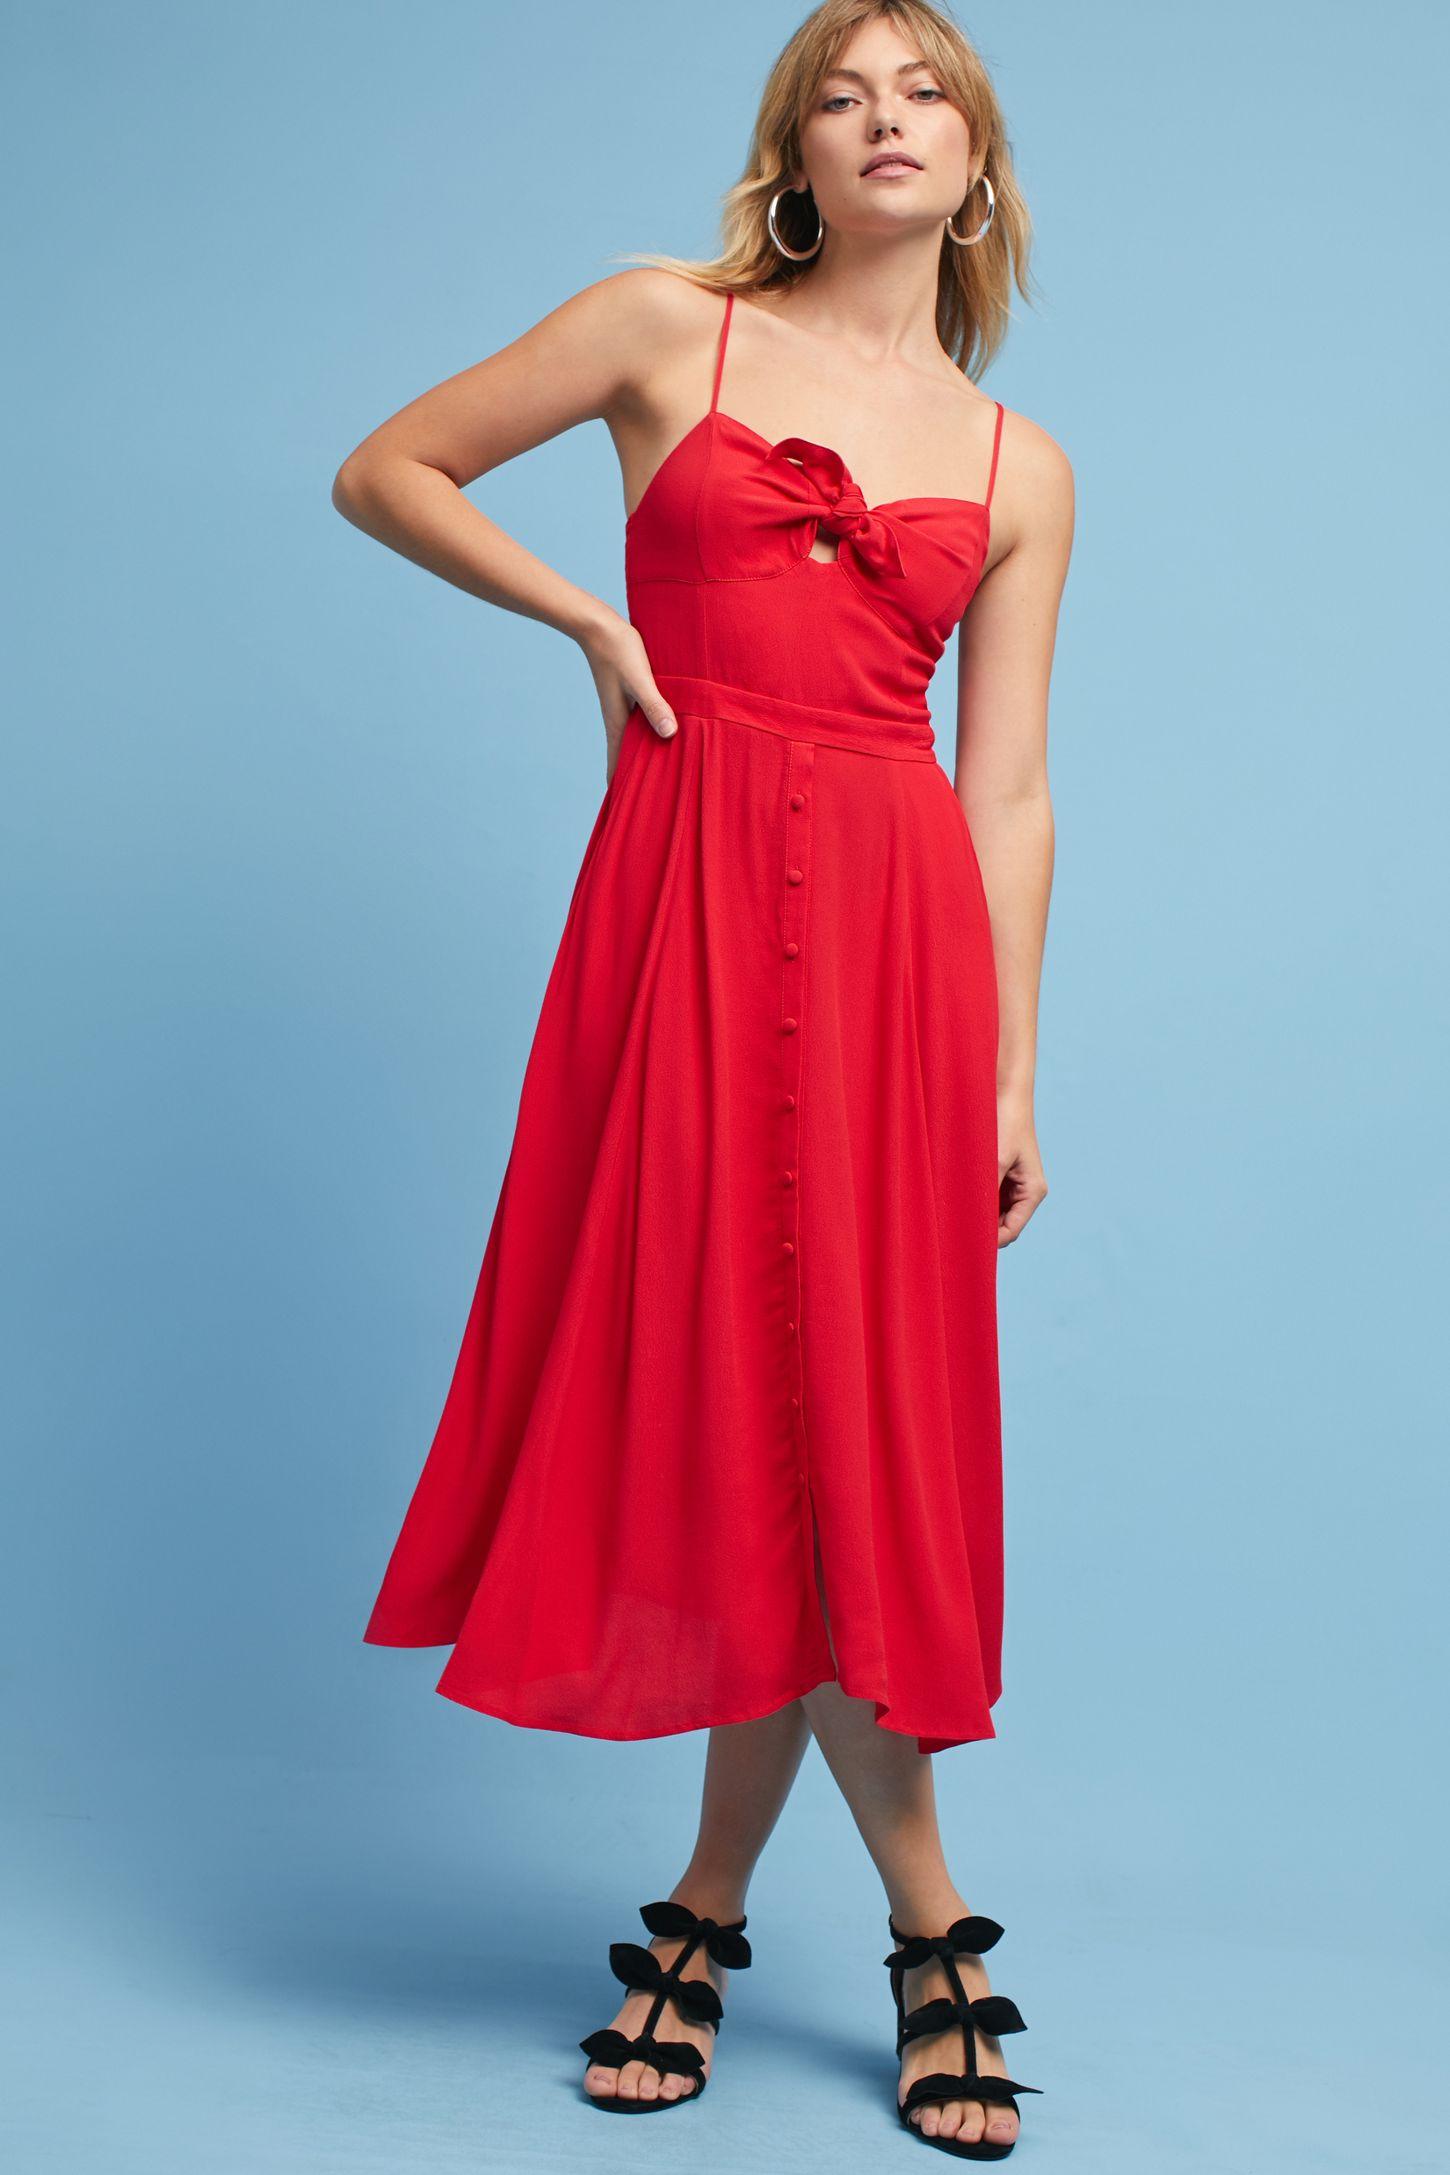 Desma Tie-Front Dress | Anthropologie